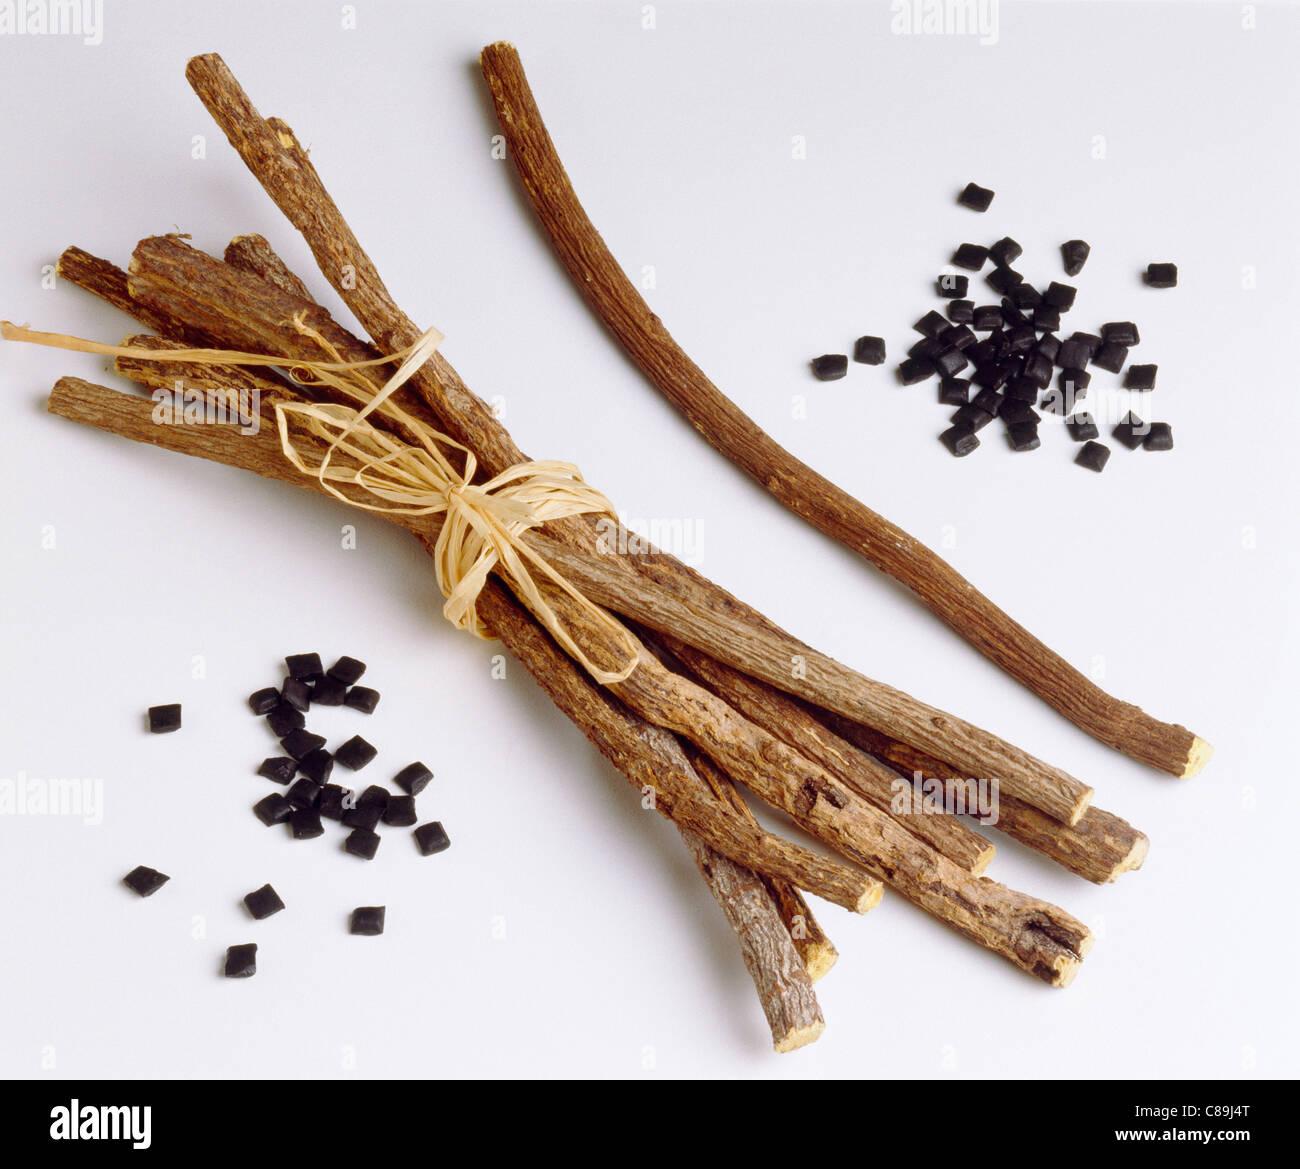 Sticks of liquorice - Stock Image